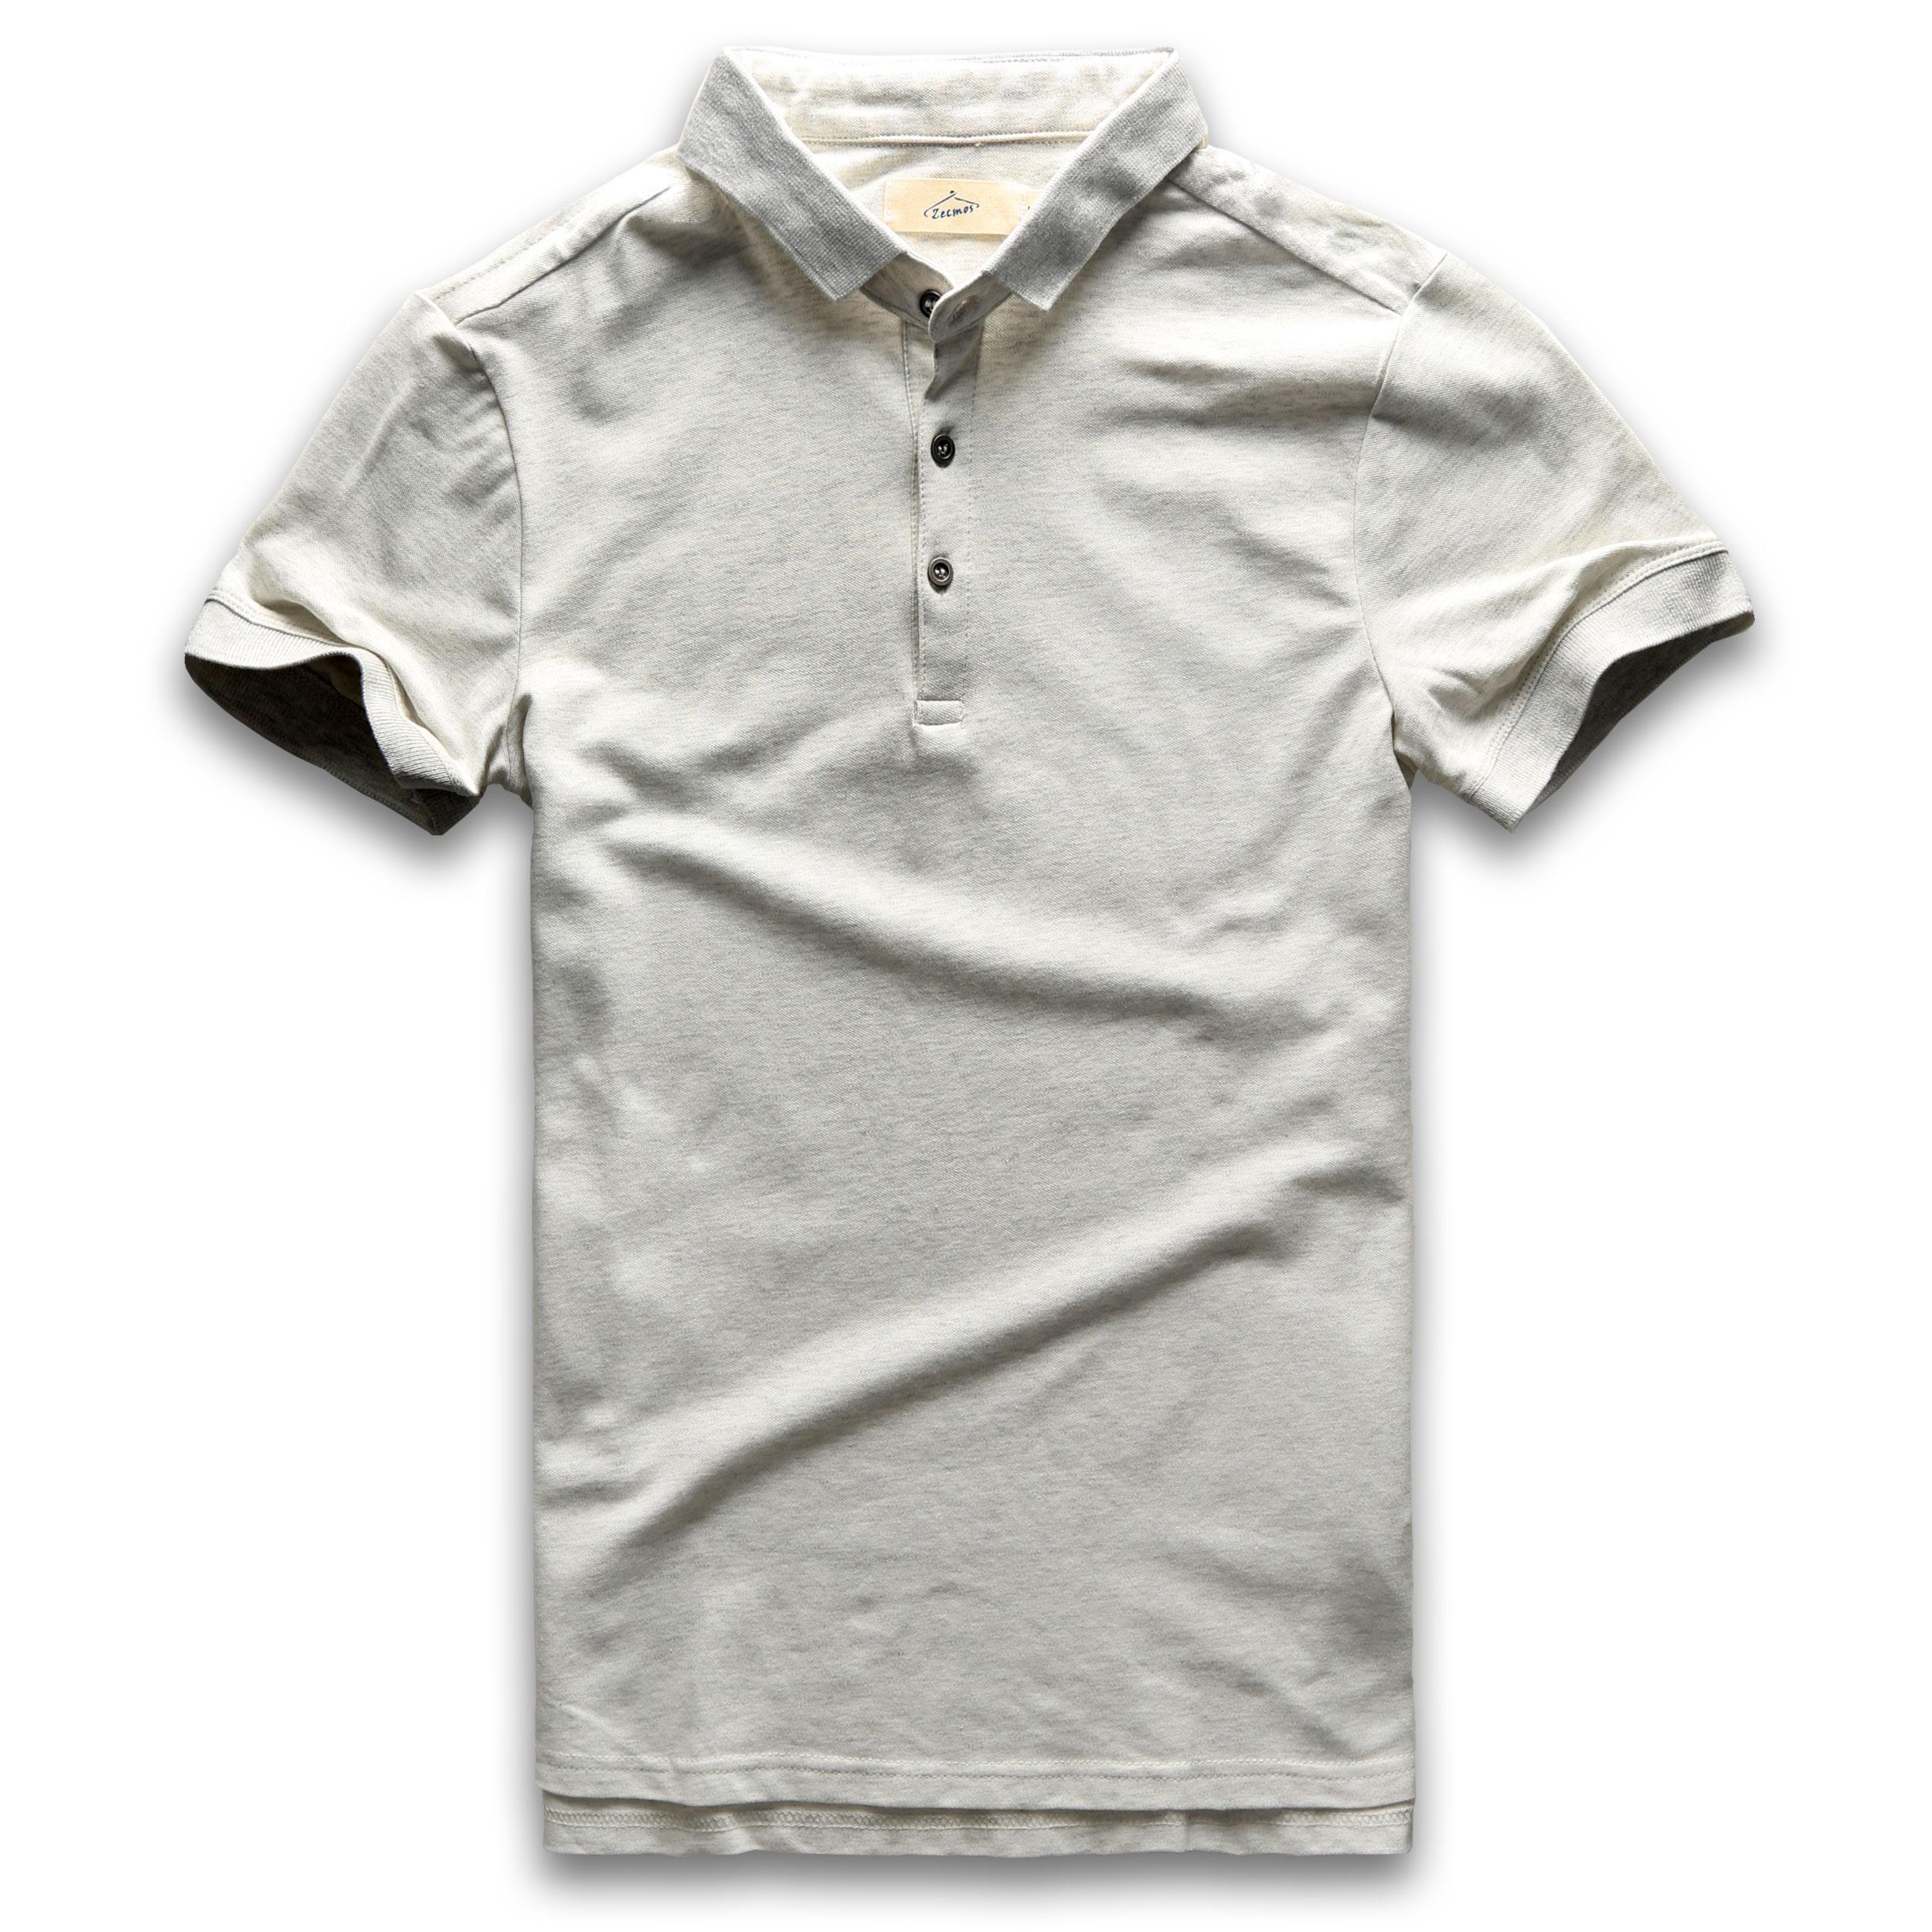 Classic Polo Shirt Men Short Sleeve Polo Shirts Summer Cotton Breathable Turn Down Collar Vintage Grey